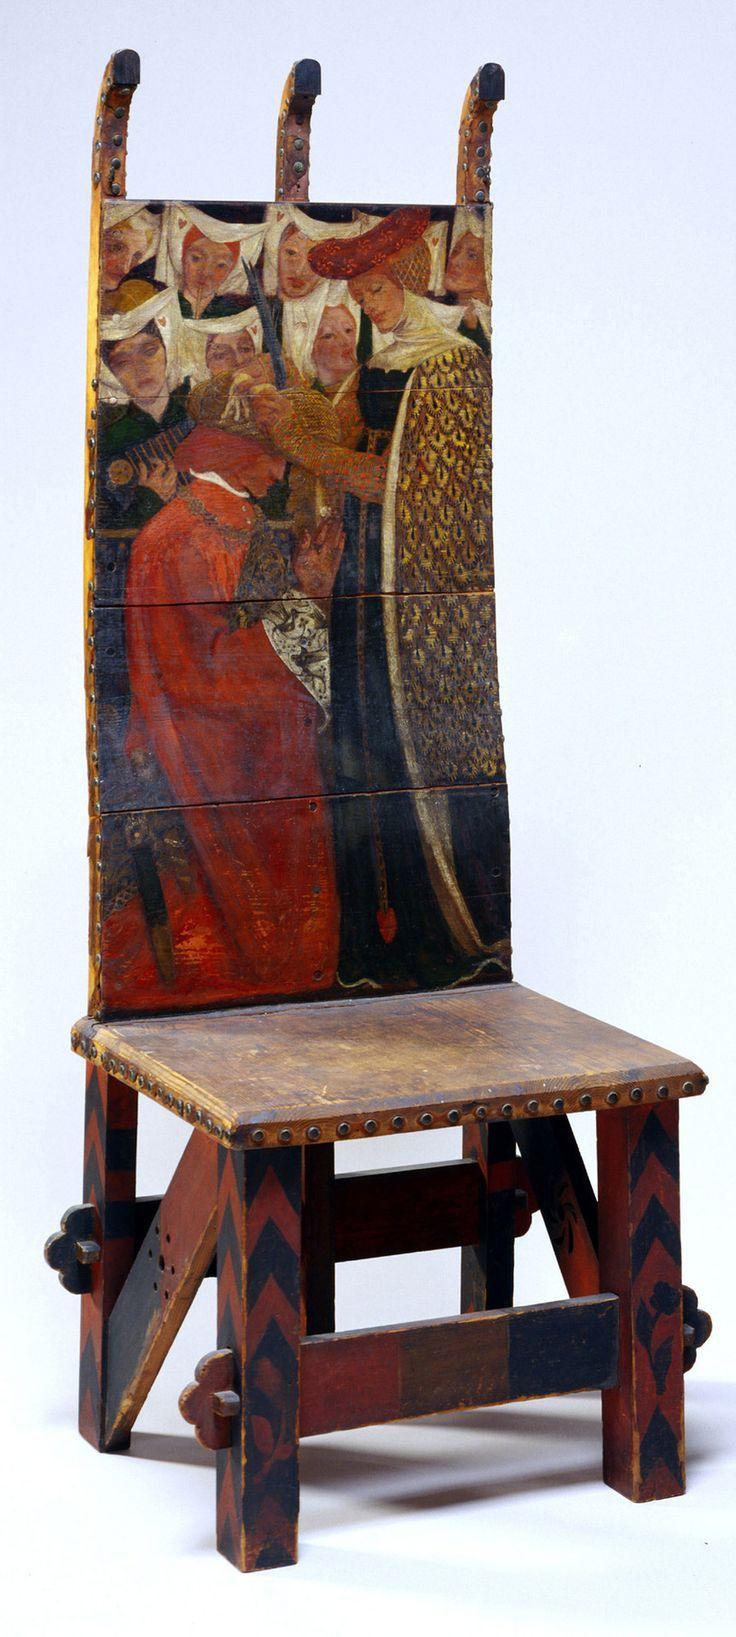 William Morris and Dante Gabriel Rossetti, 1856-57